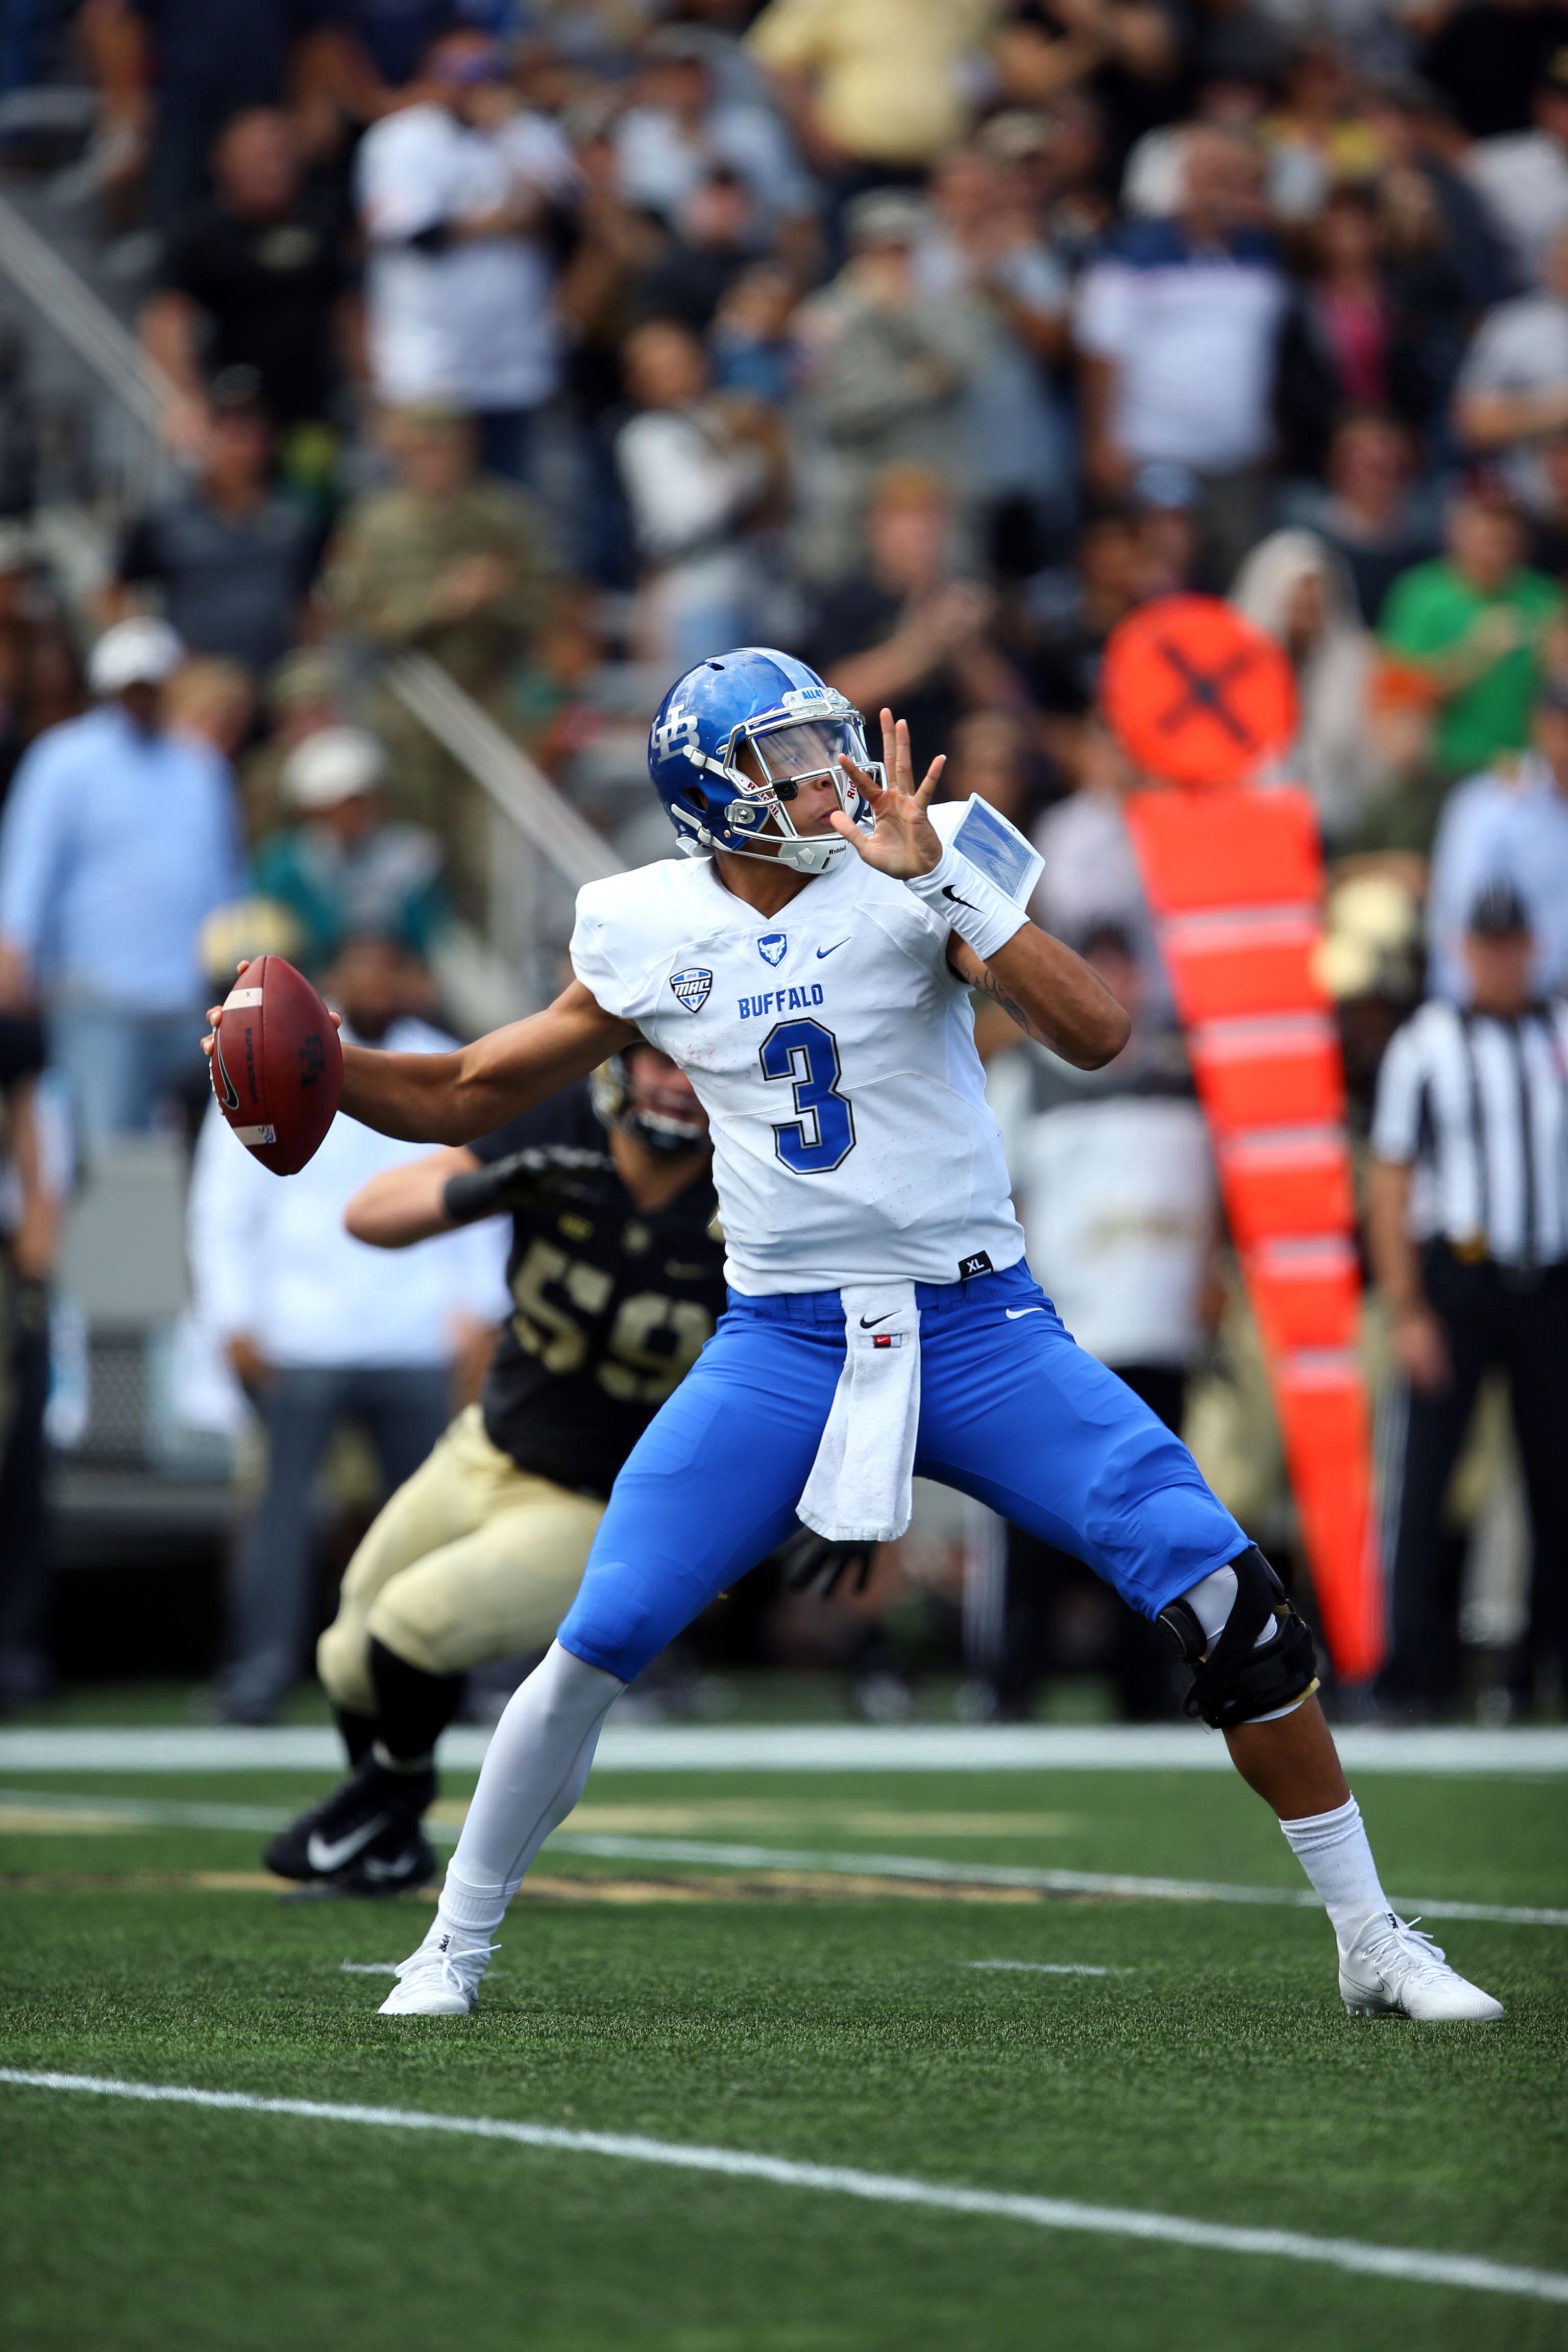 sports shoes 274da 7da61 2019 NFL Draft: college football prospect preview & live ...